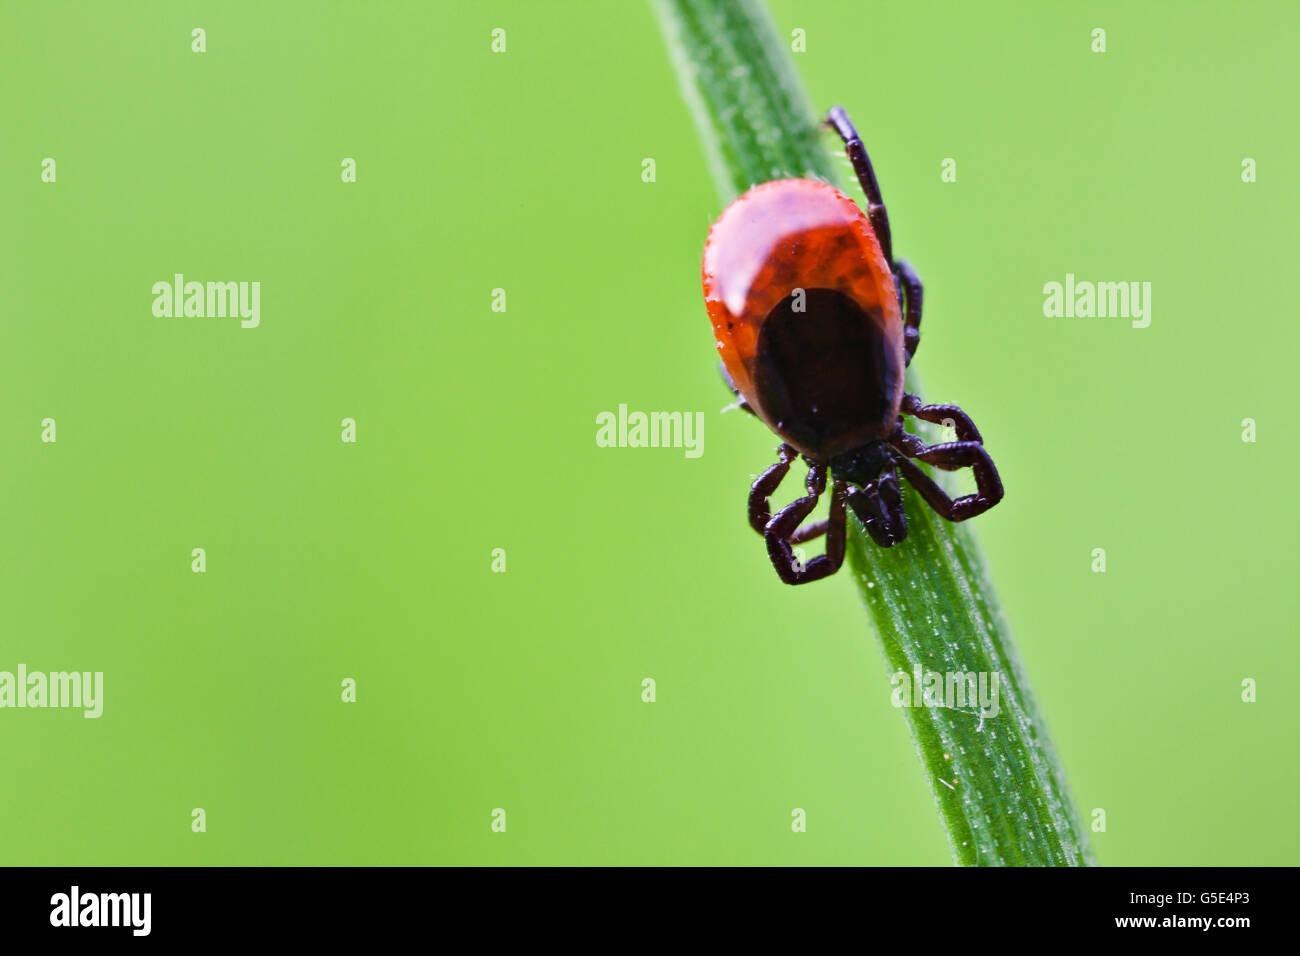 Castor Bean Tick (Ixodes ricinus), on a blade of grass - Stock Image